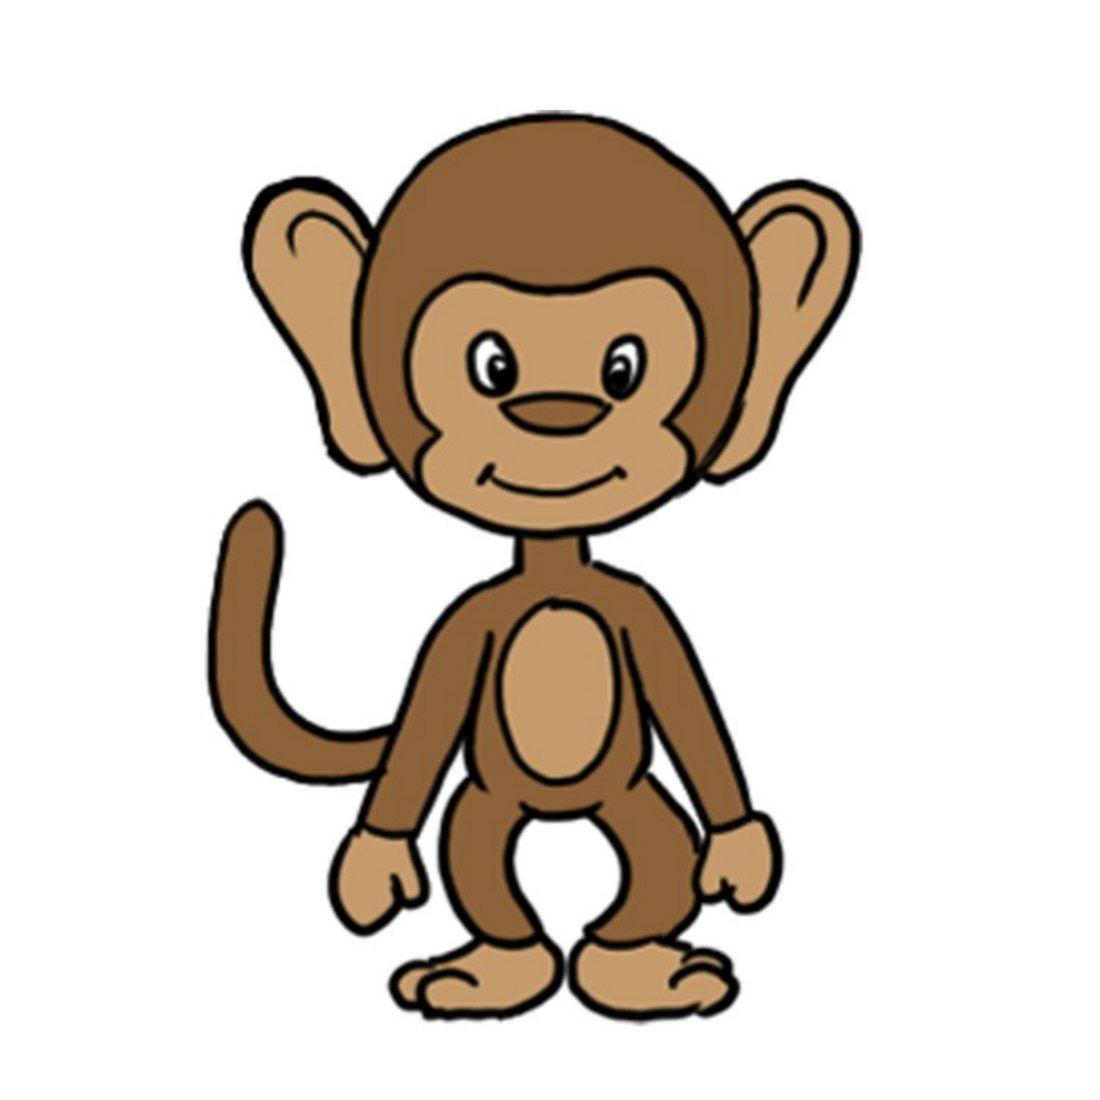 картинки обезьян нарисовать любителей мопедов